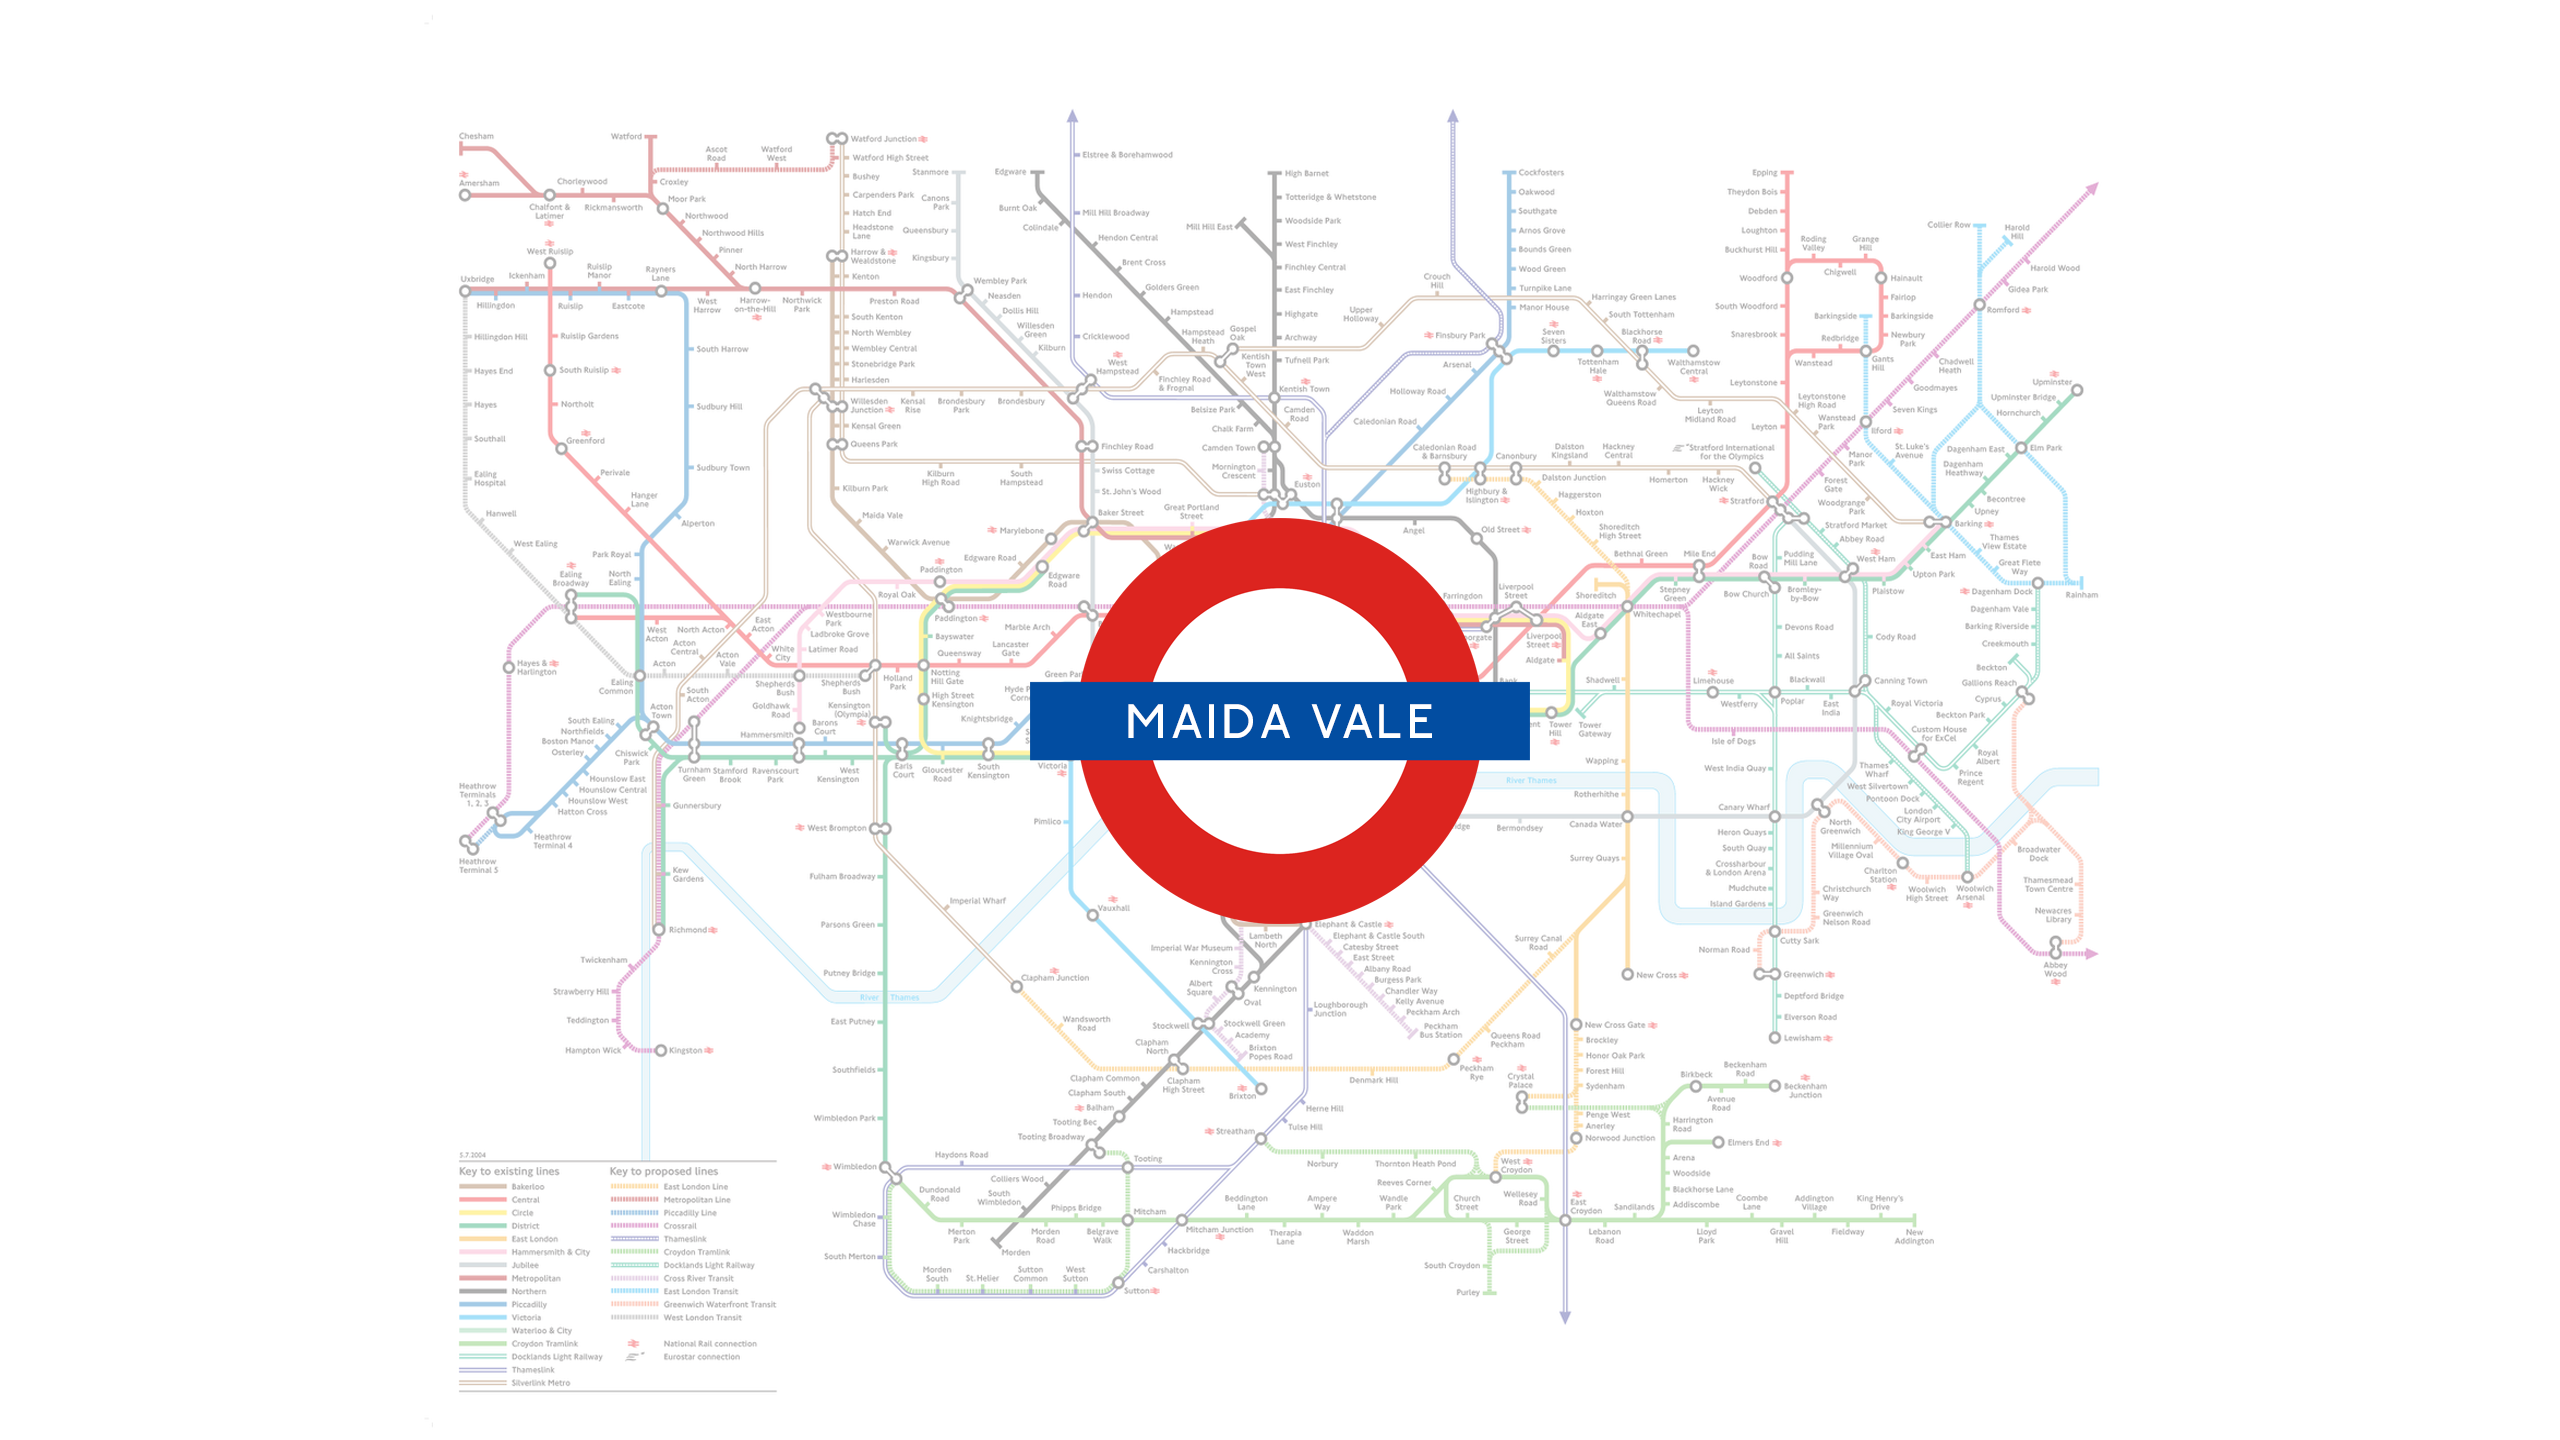 Maida Vale (Map)